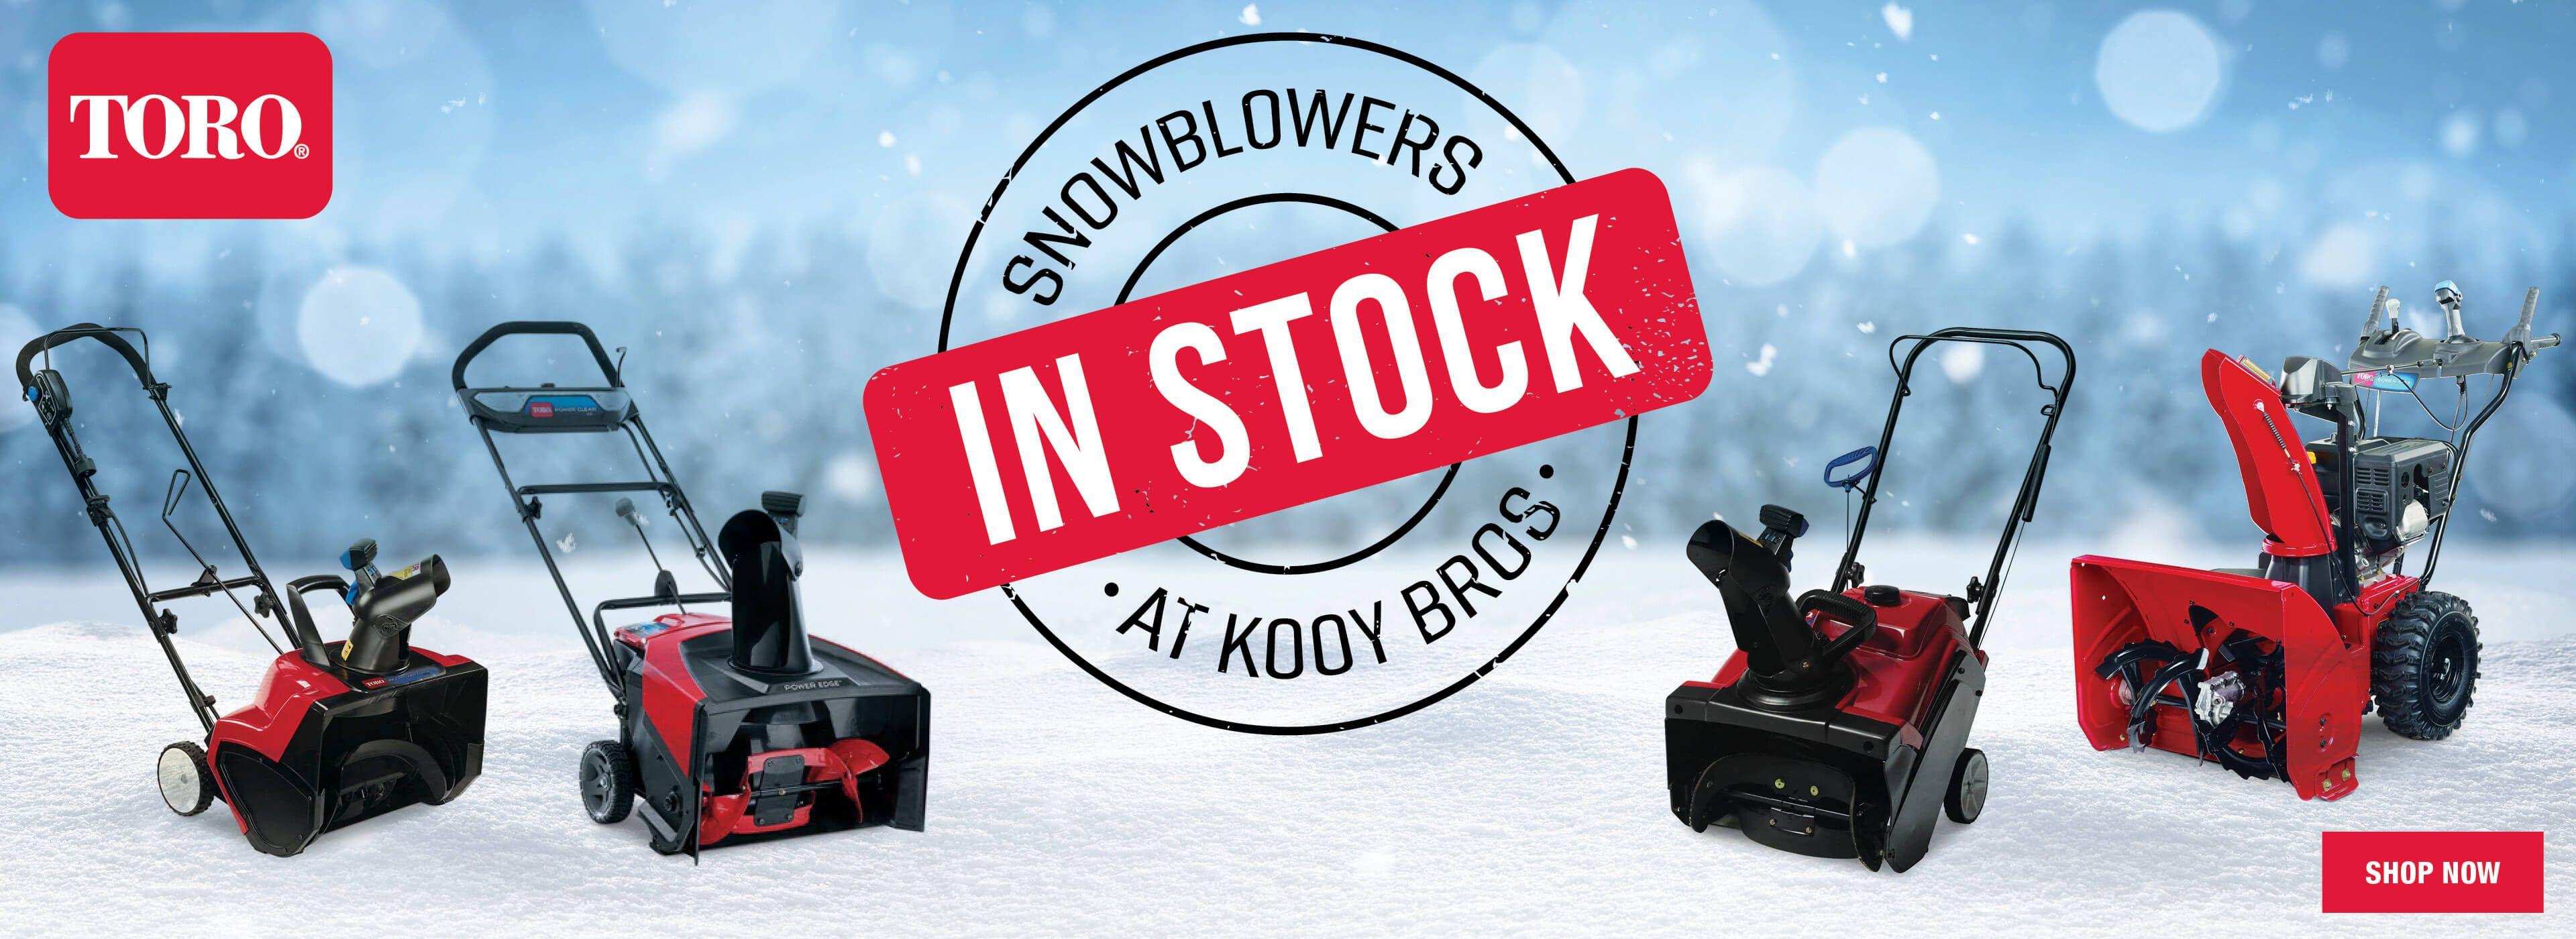 Snowblowers In Stock 2020